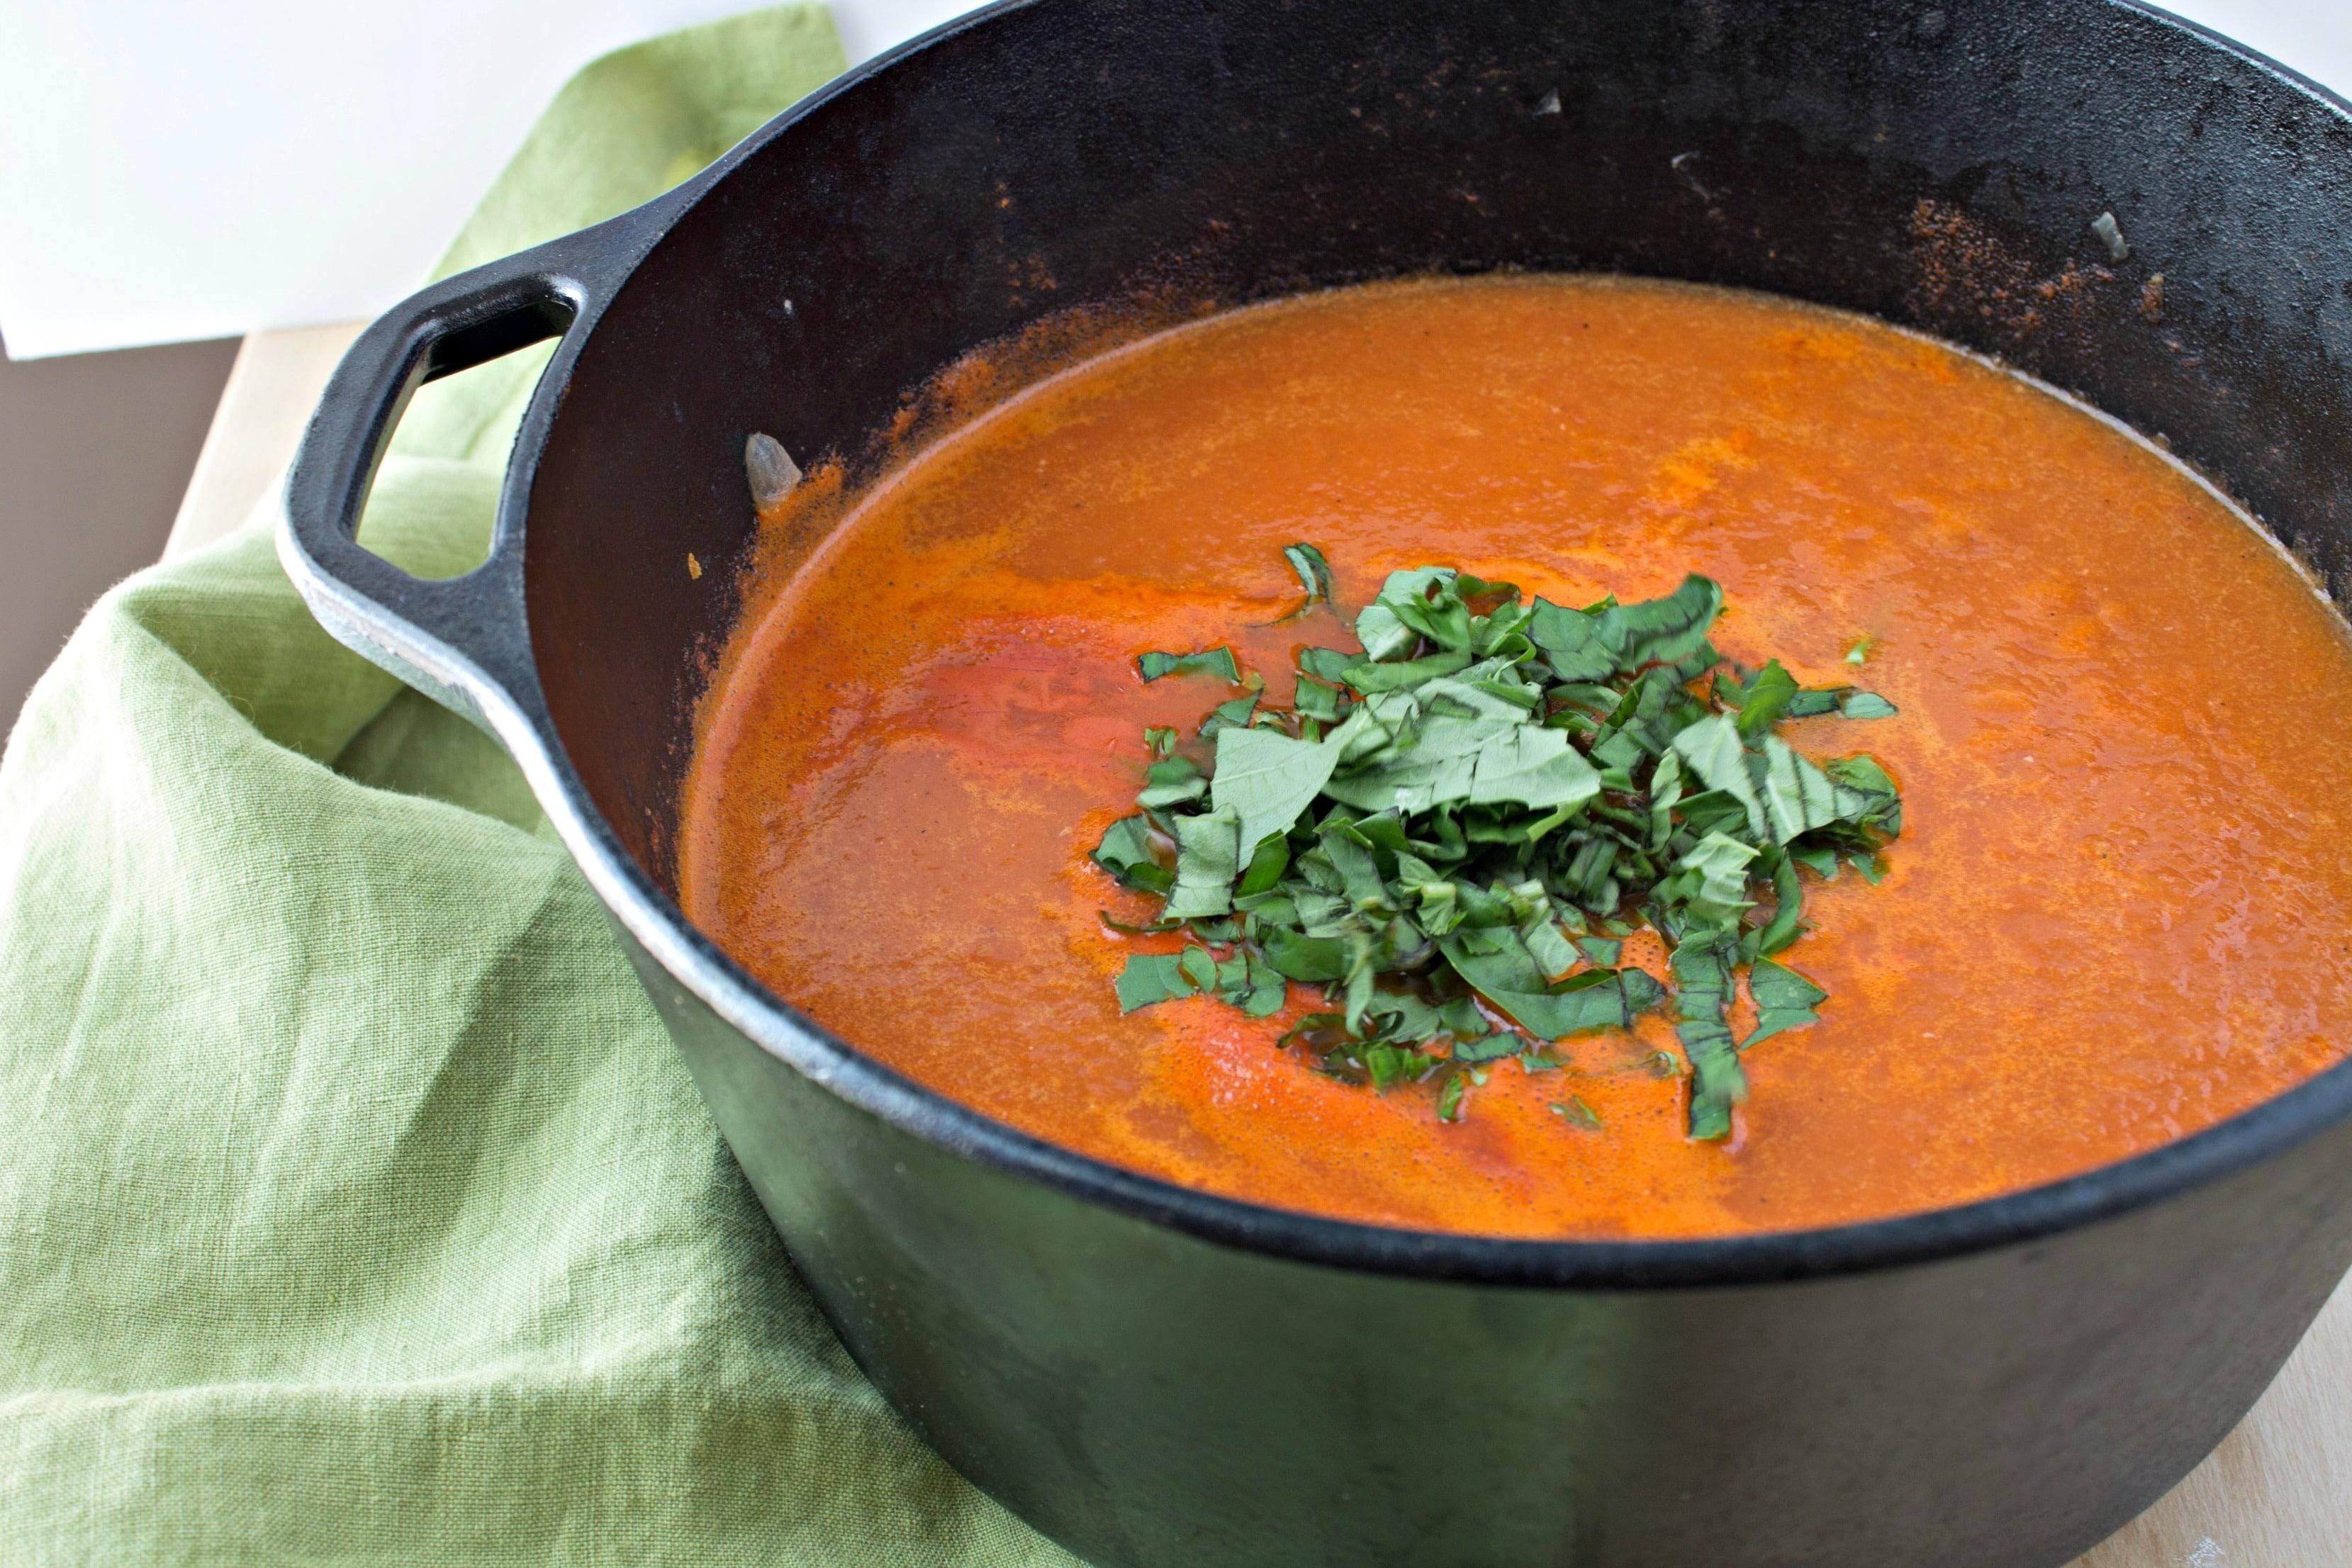 Creamy Tomato Basil Soup With Basil